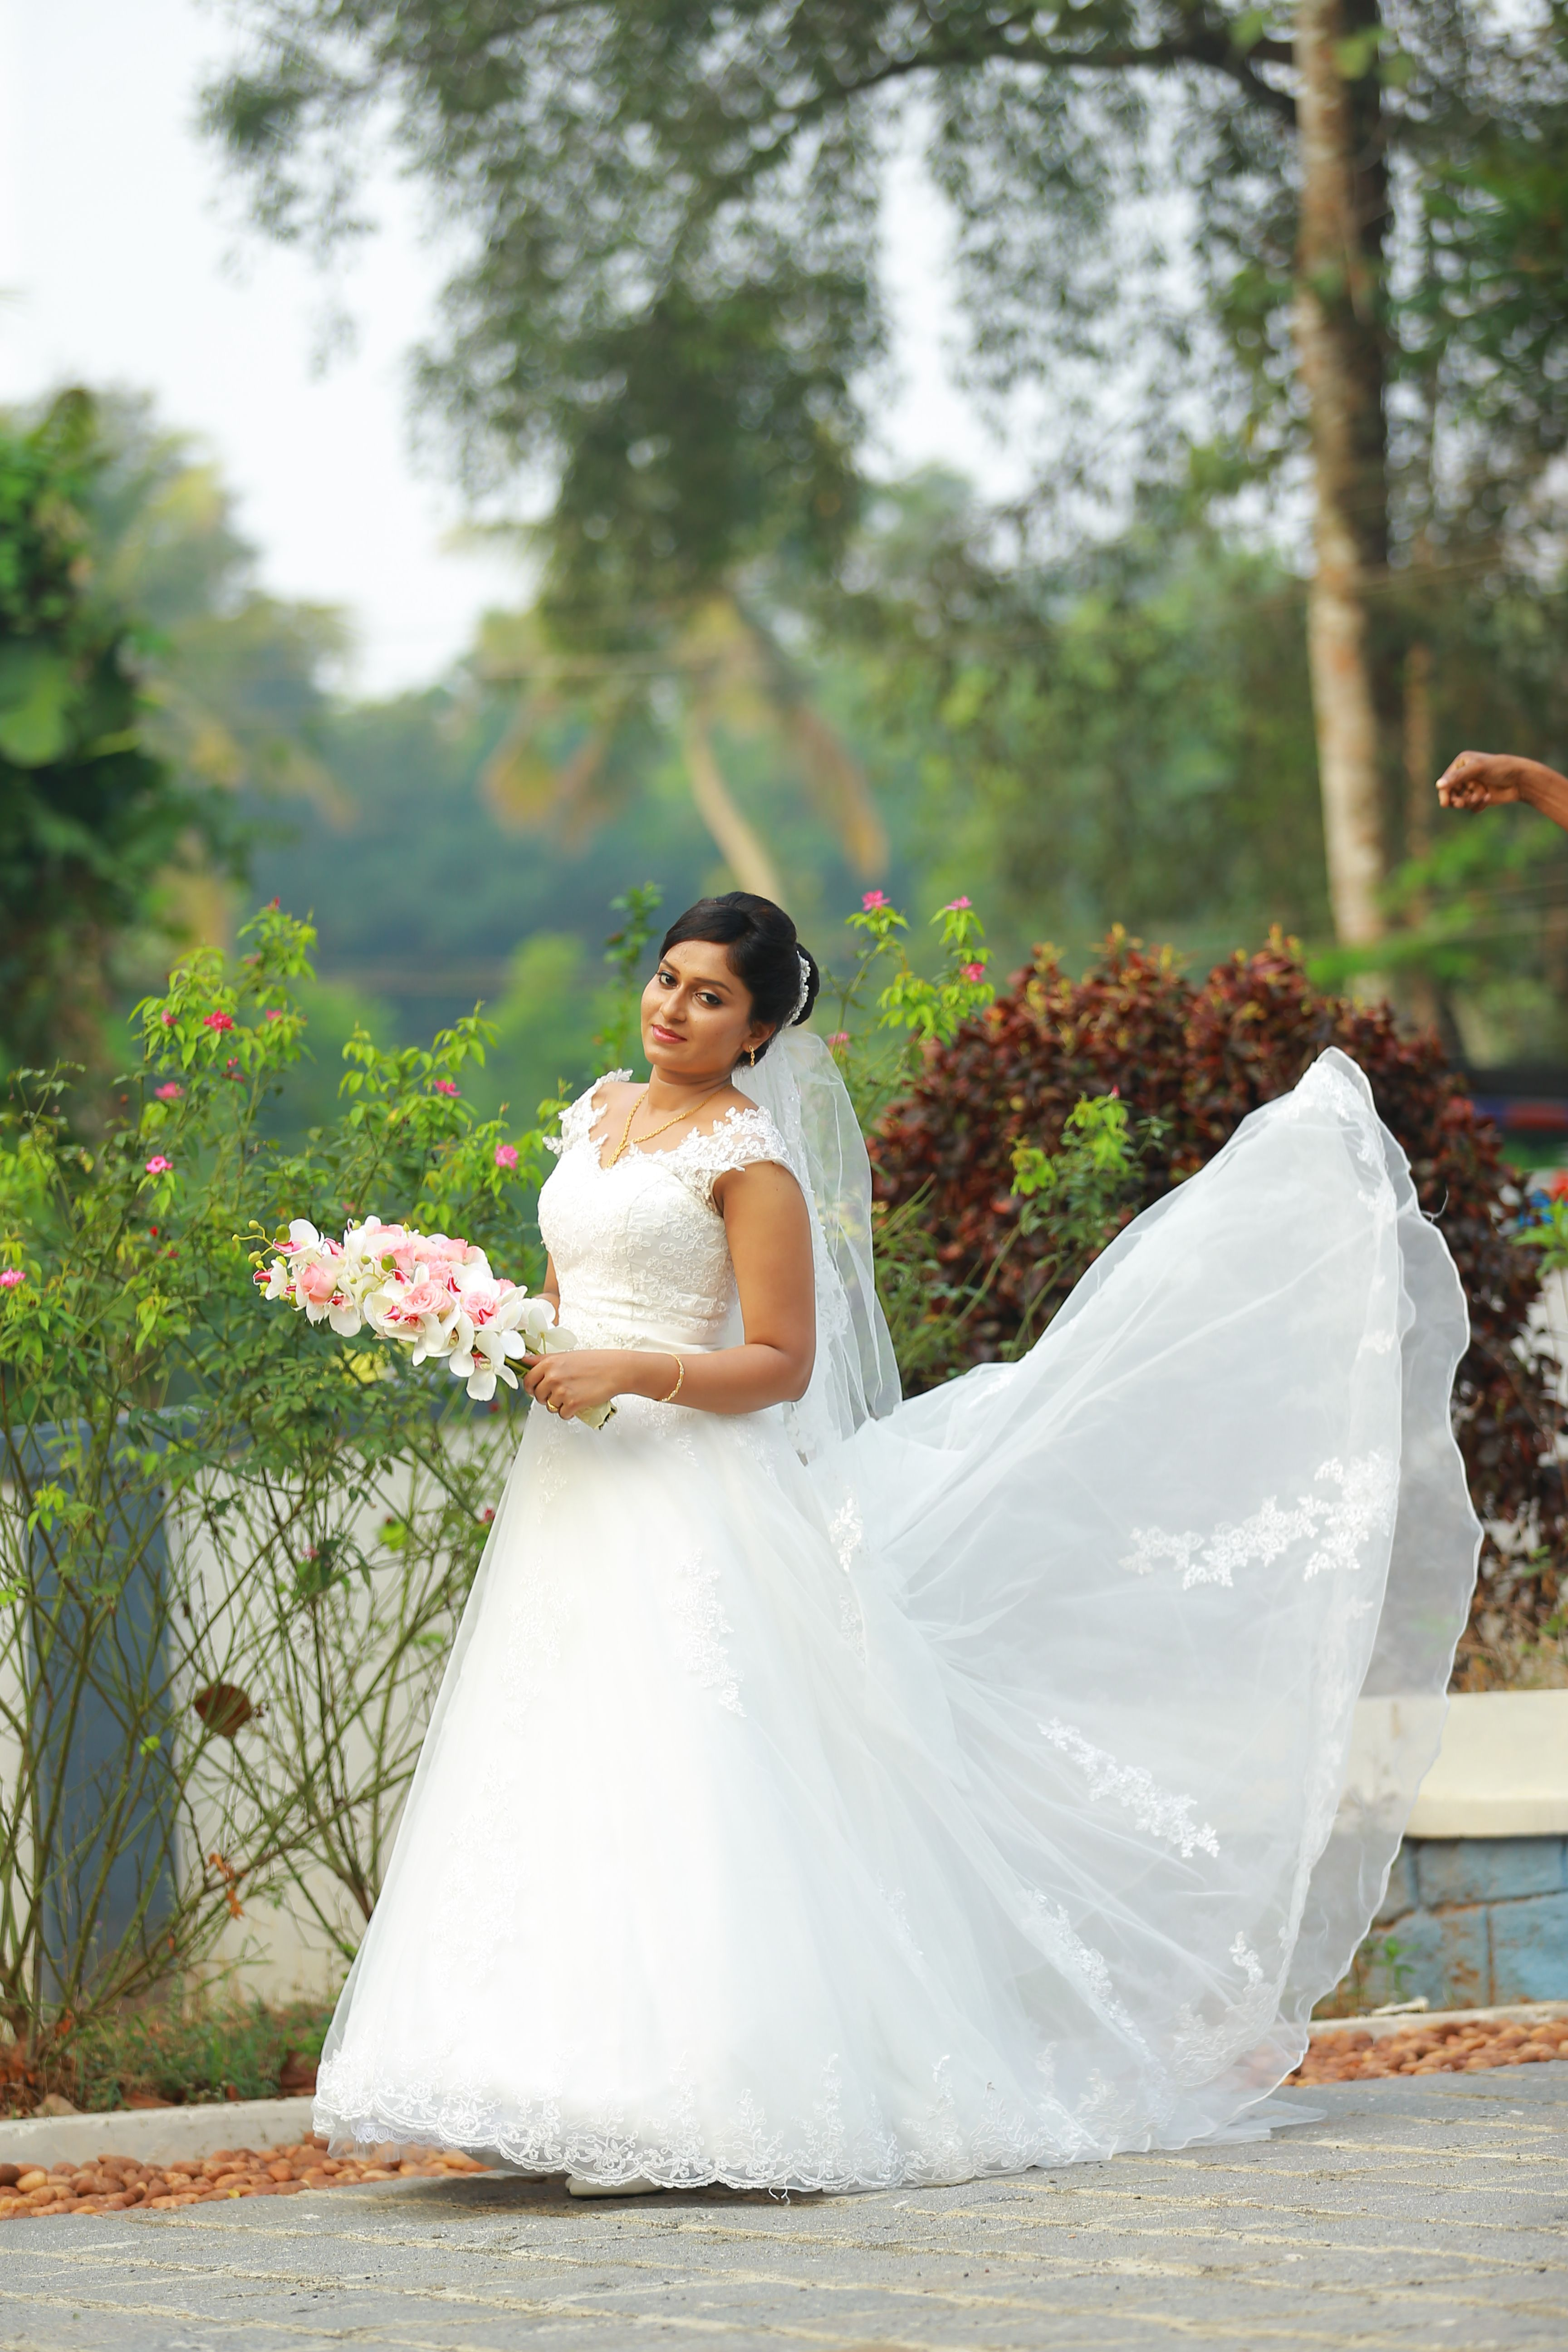 Christian Bride